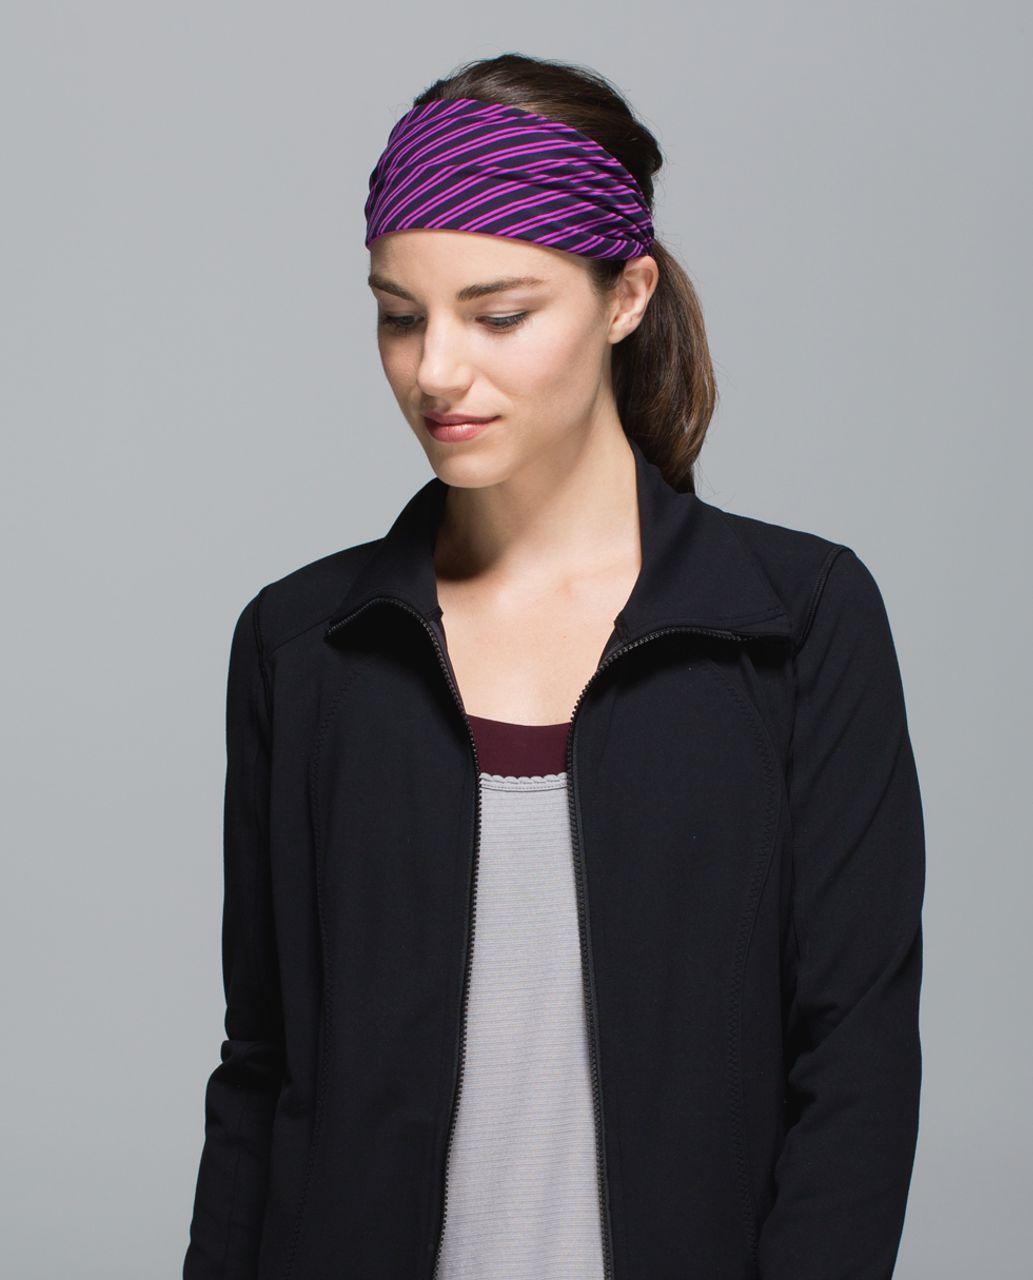 Lululemon Bang Buster Headband *Reversible - Double Trouble Stripe Ultra Violet Black Grape